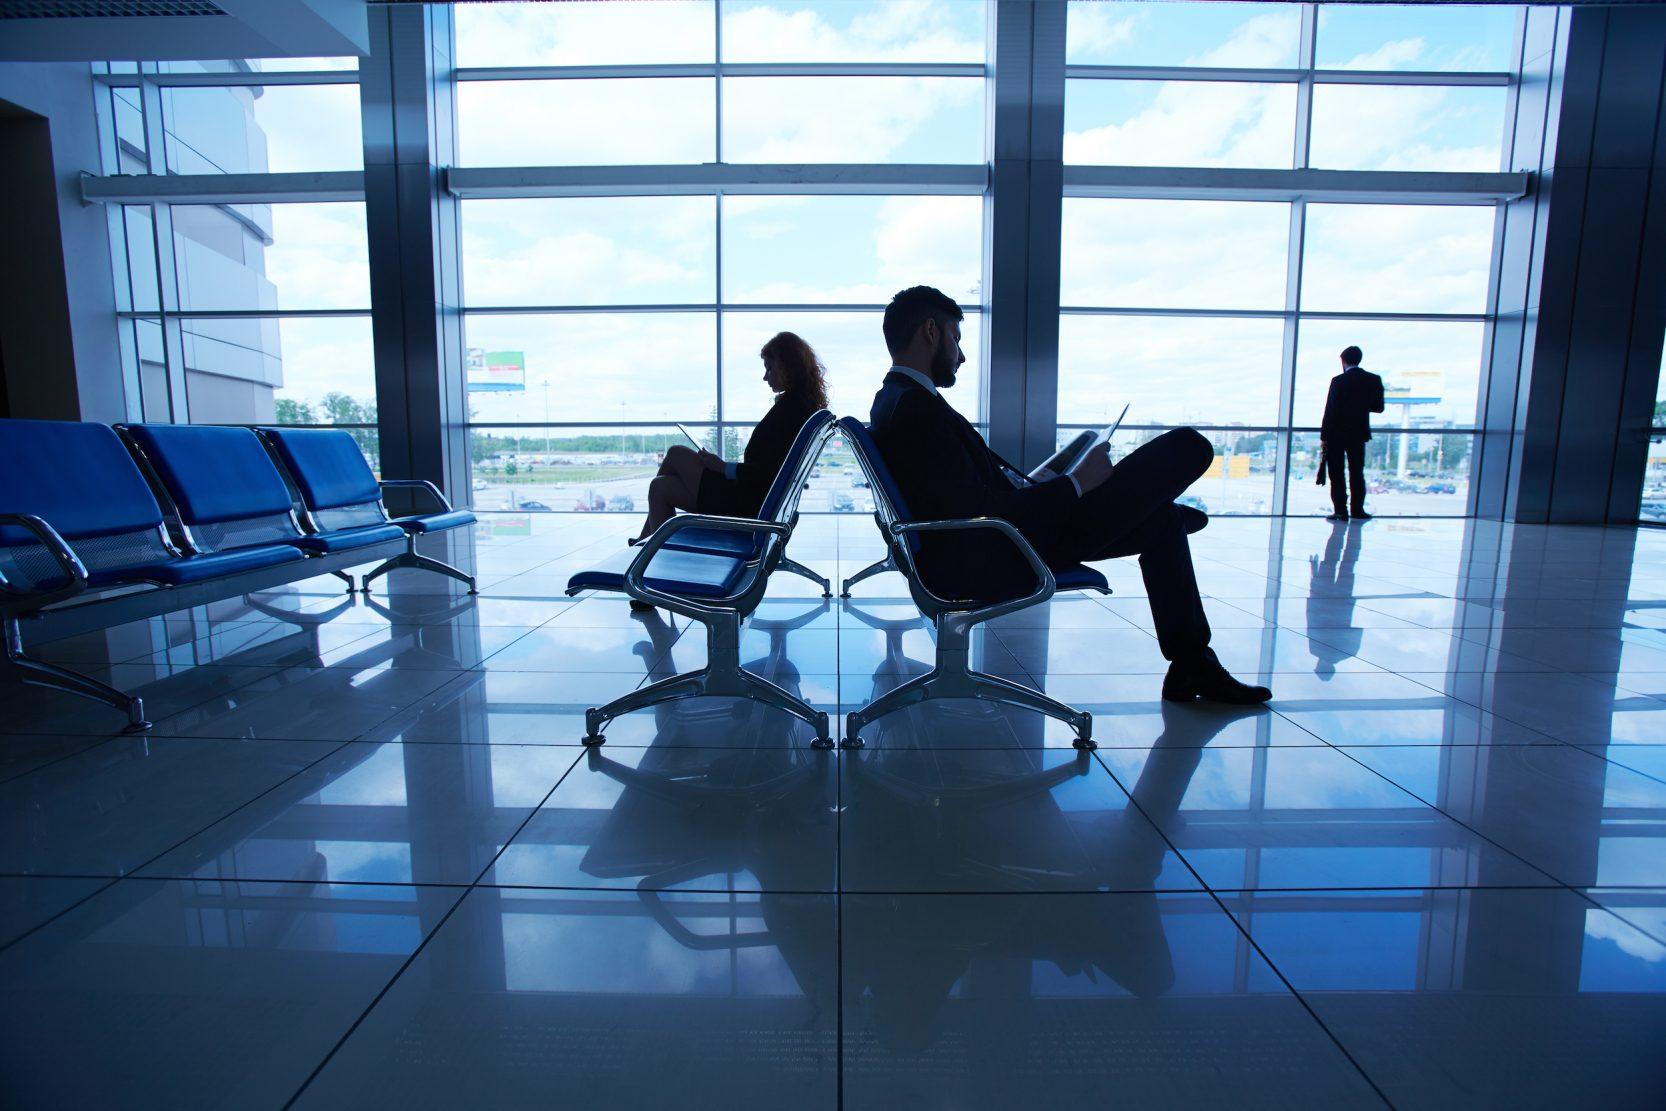 Travel slowdown threatens 46 million jobs